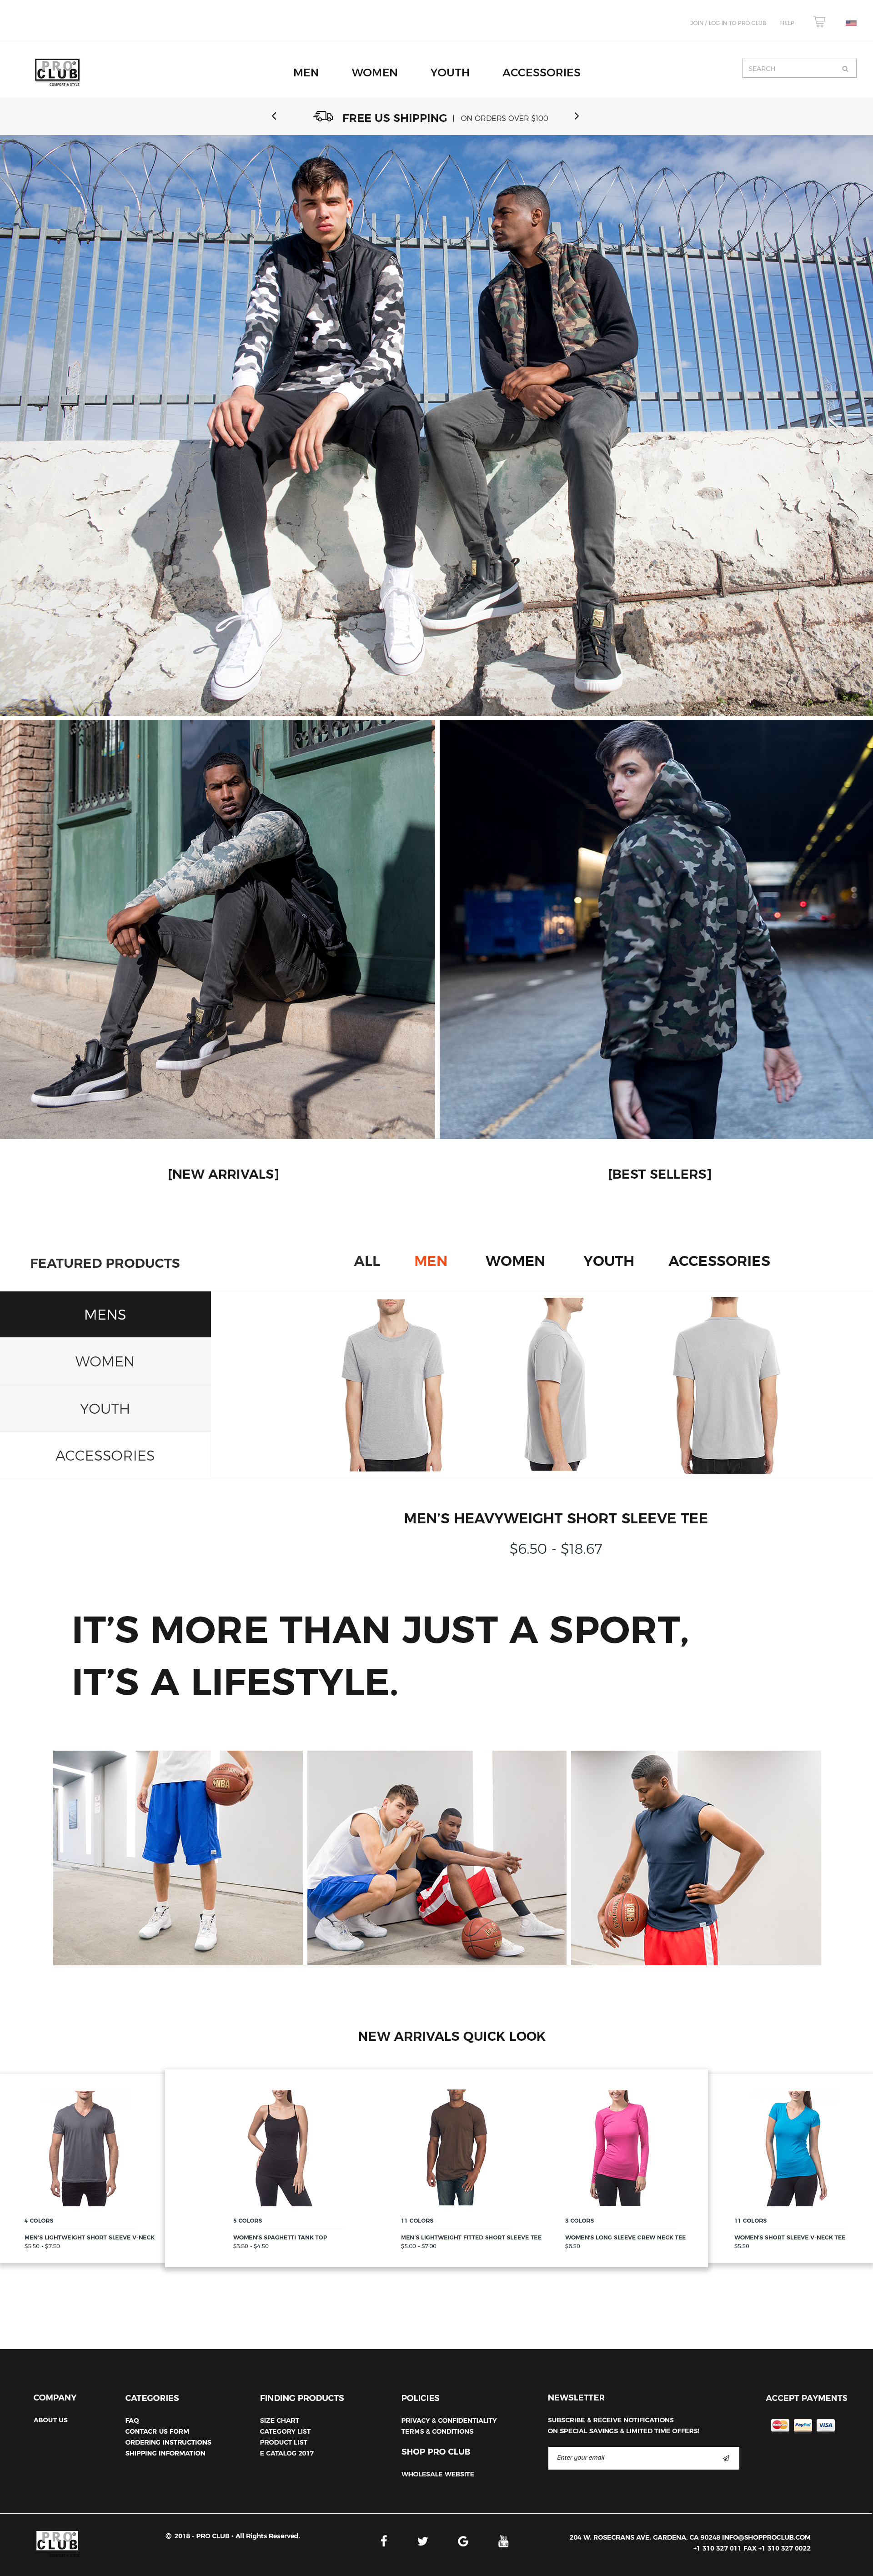 ProClub Retail Mock-Up.jpg